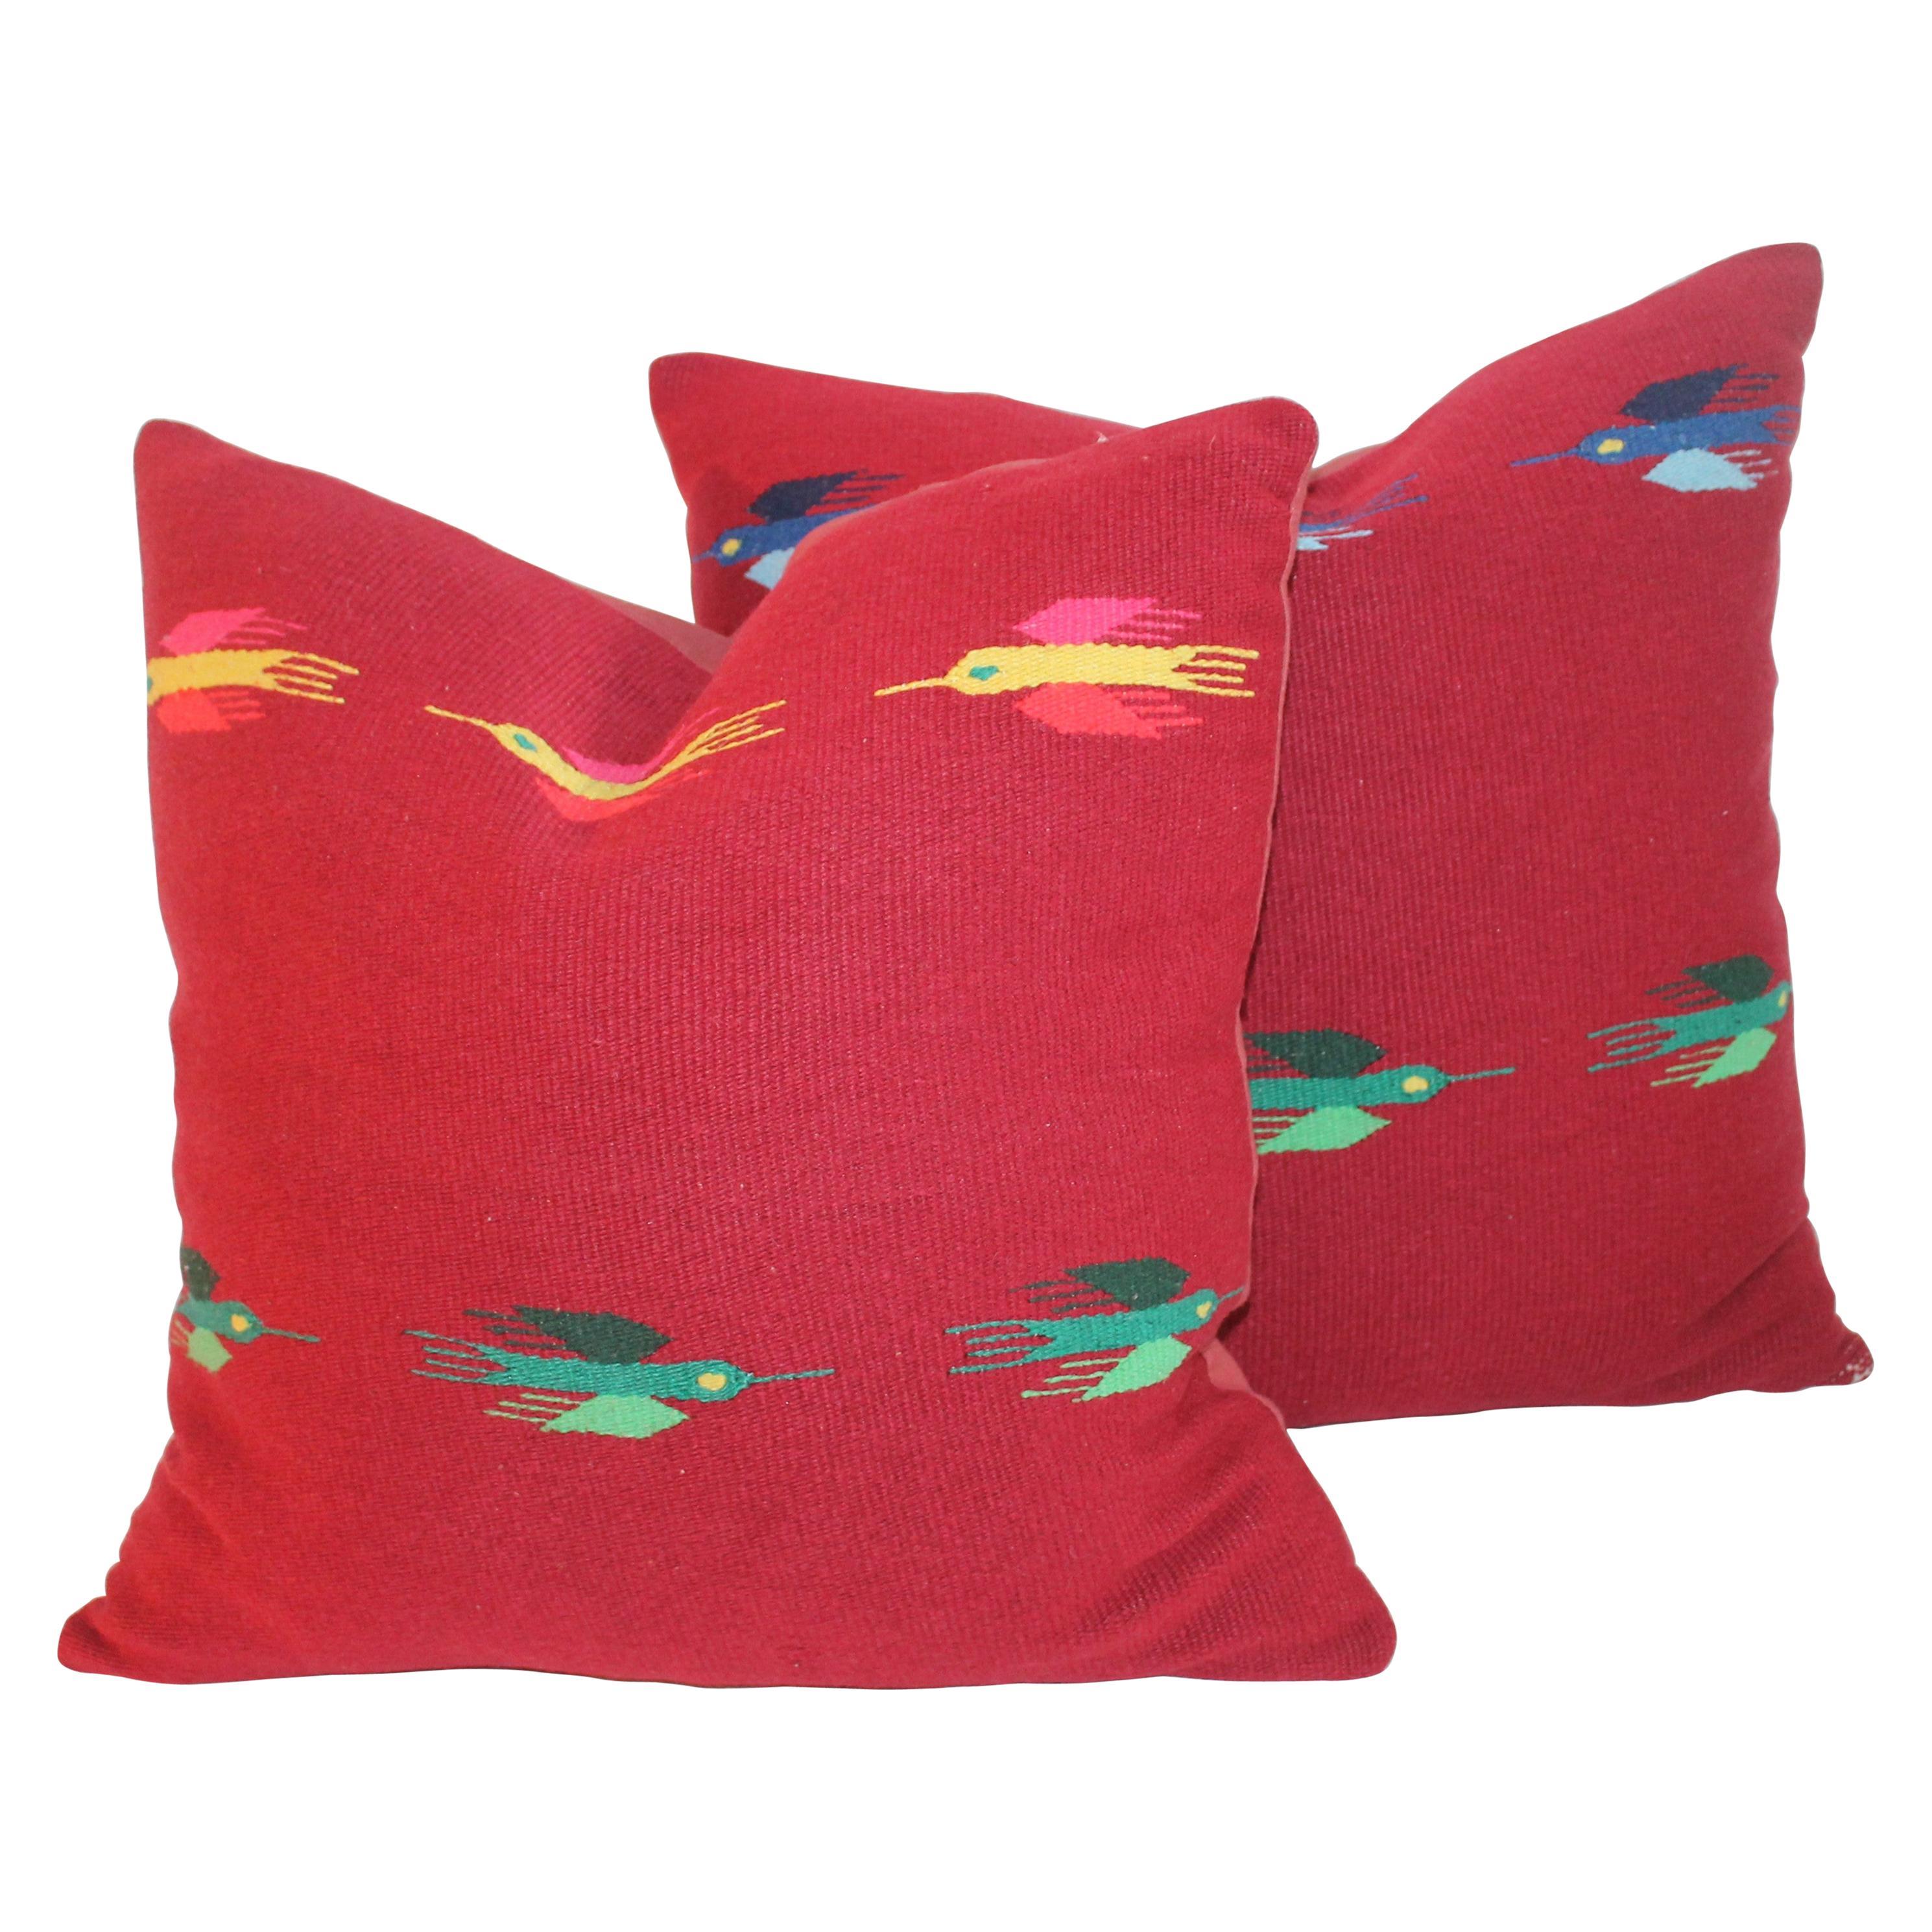 Mexican Indian Weaving Pillows, Pair